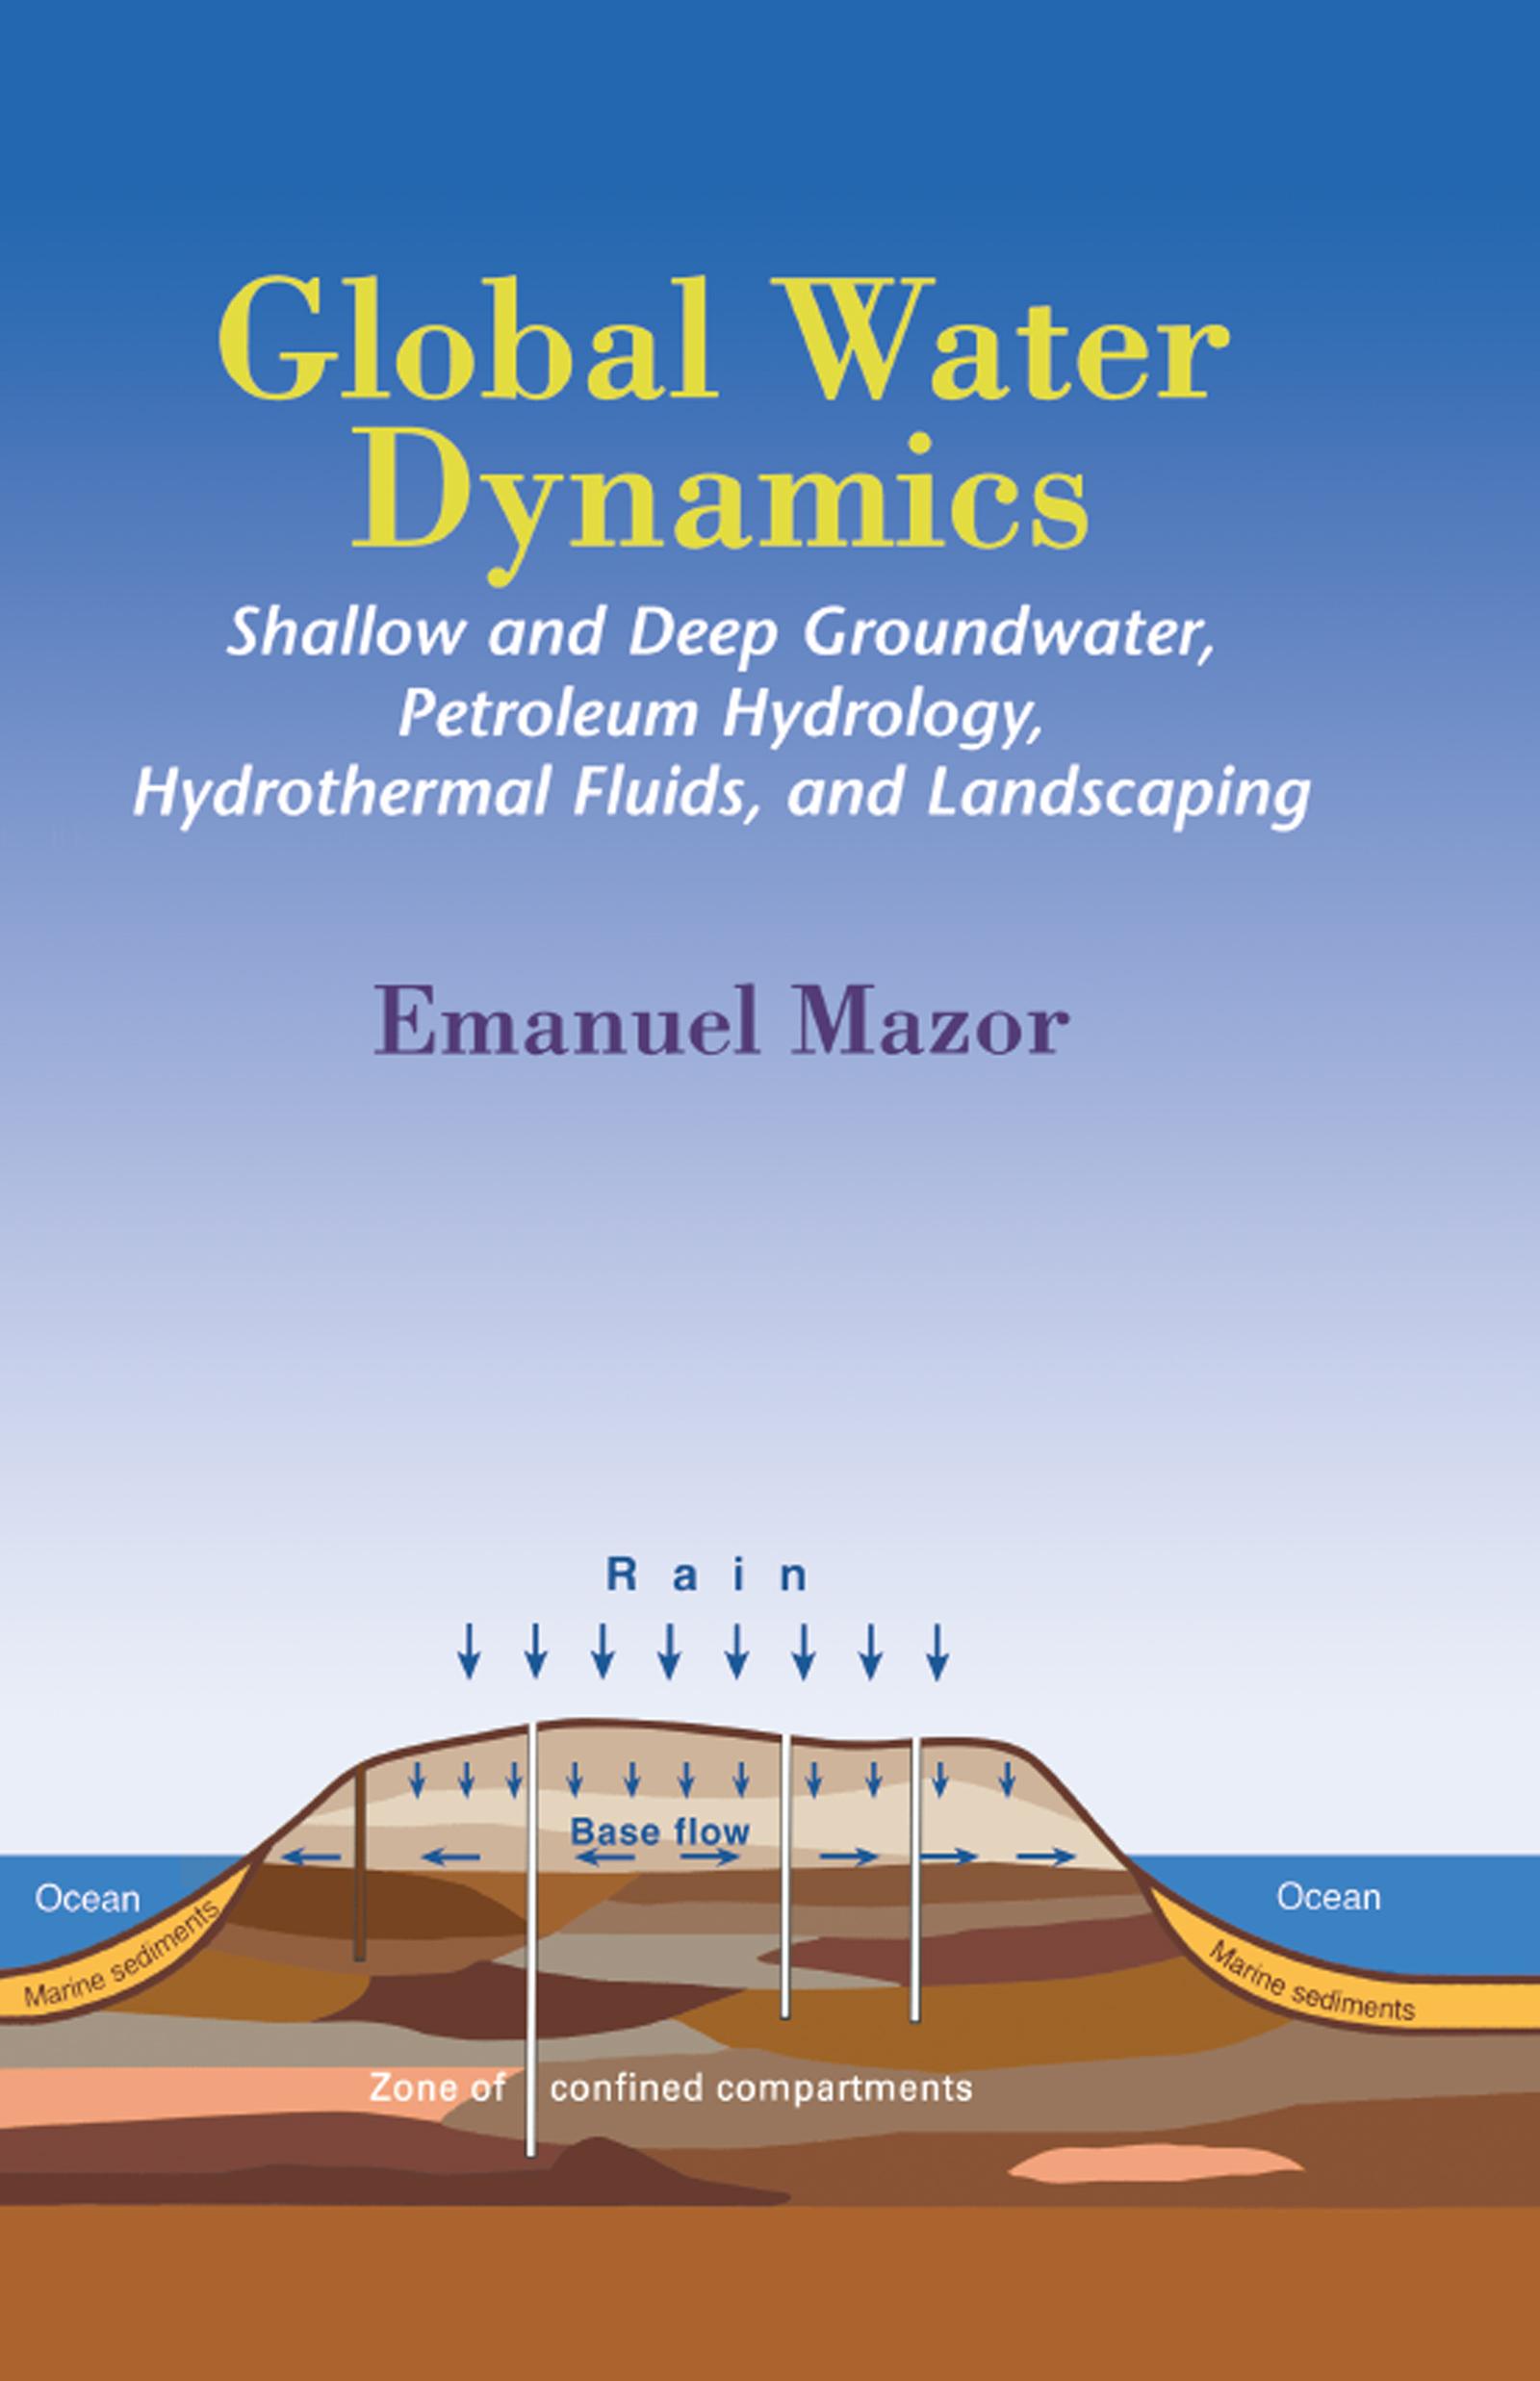 Global Water Dynamics